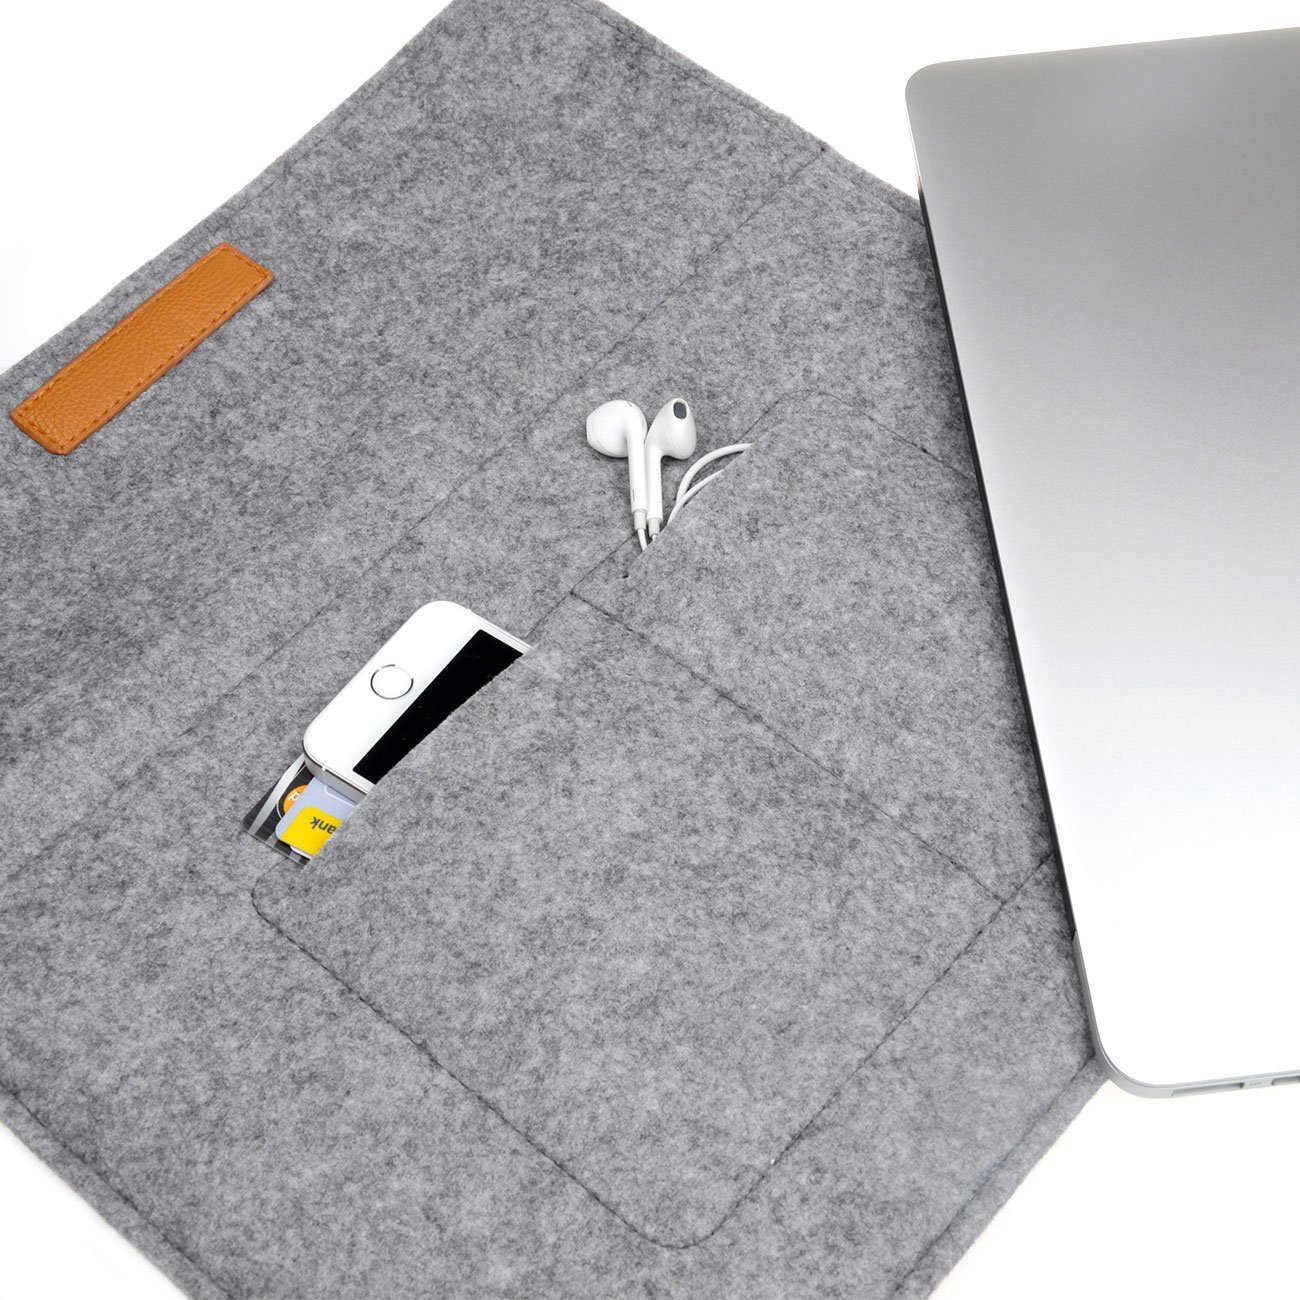 Inateck Ultrabook Envelope Case